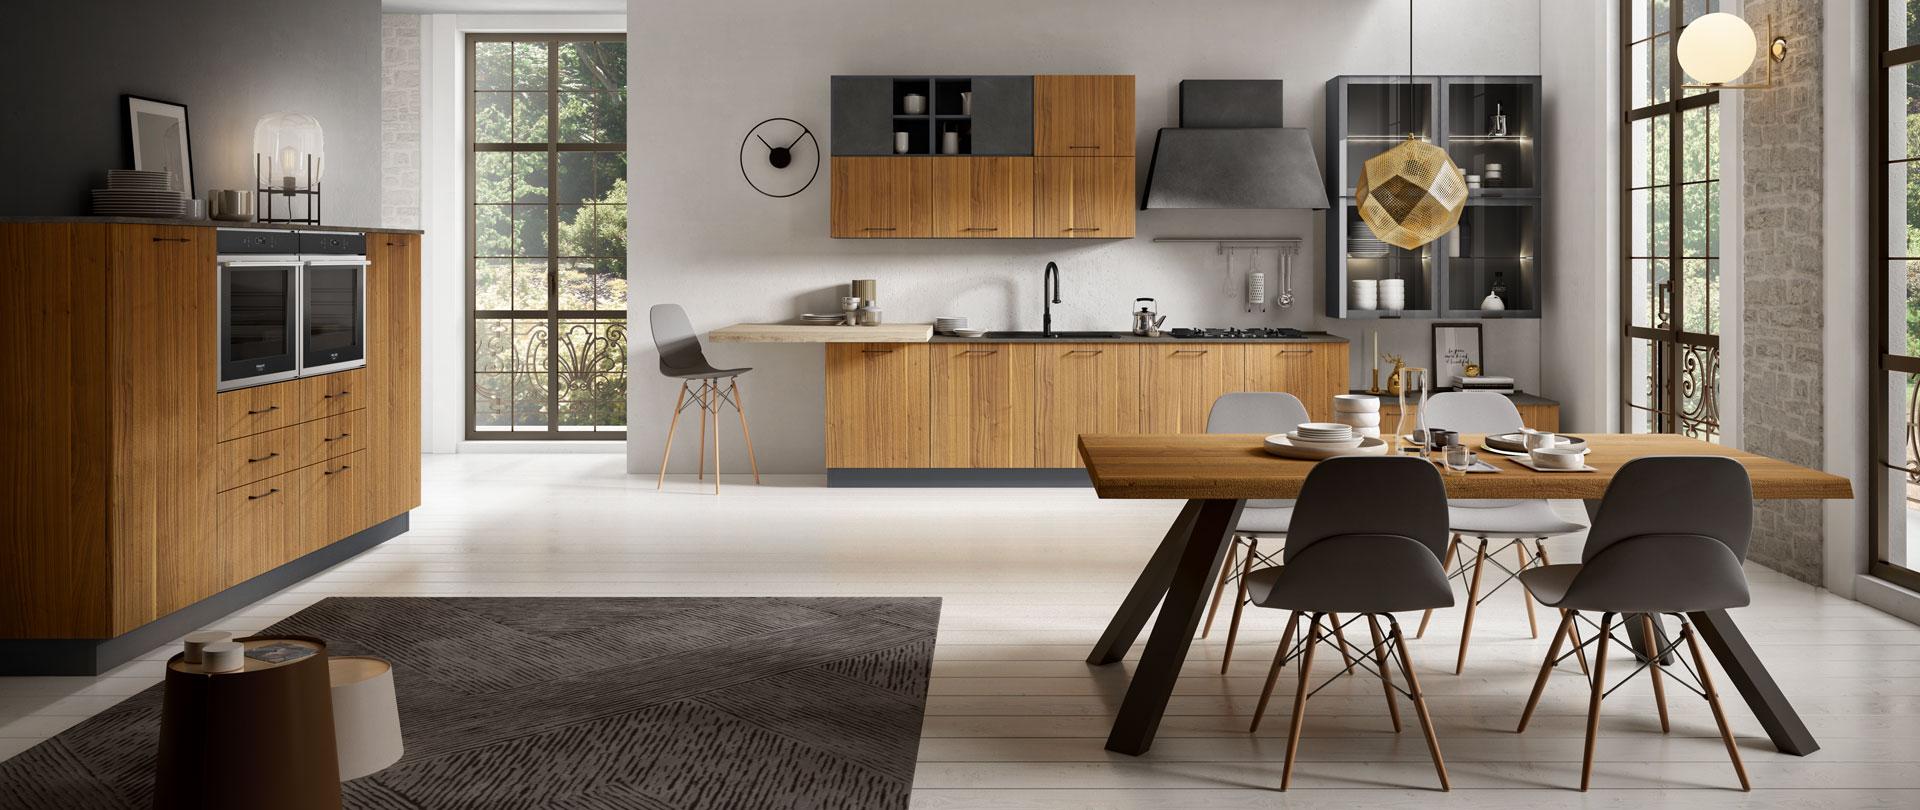 04-cucina-moderna-matrix-noce-canaletto